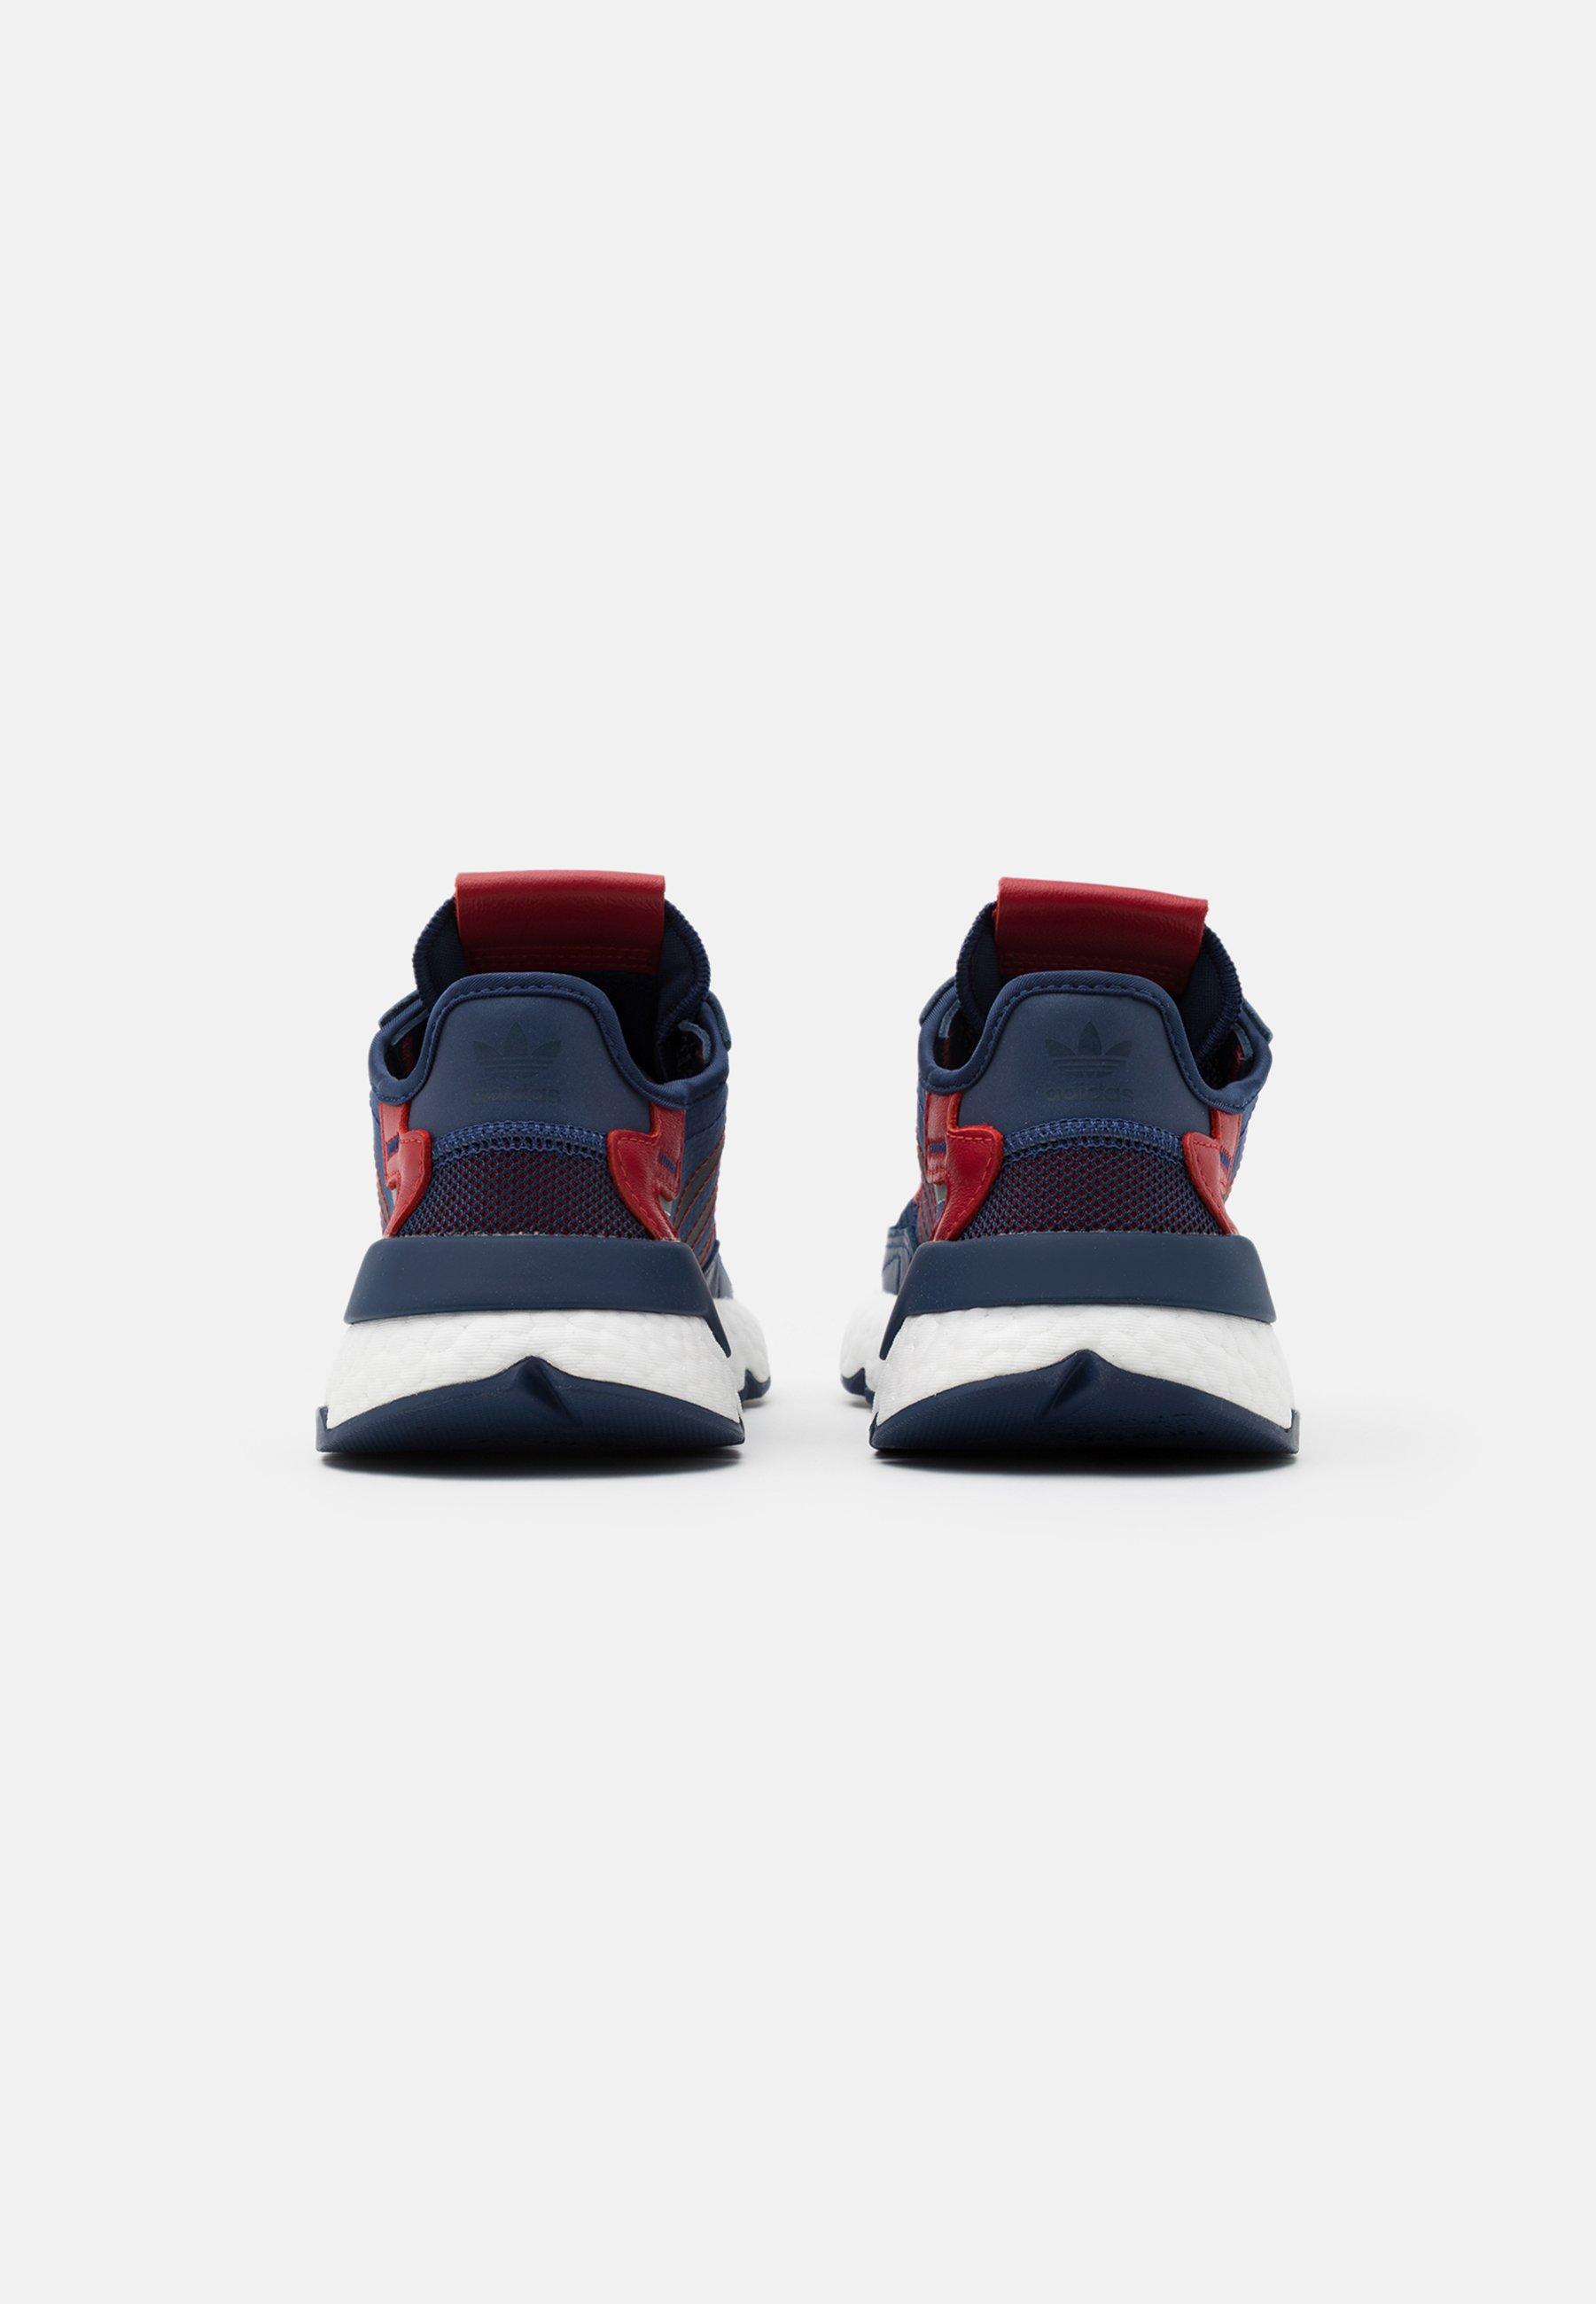 adidas Originals NITE JOGGER BOOST SPORTS INSPIRED SHOES - Sneaker low - tech indigo/collegiate navy/scarlet/dunkelblau - Herrenschuhe UUVMR